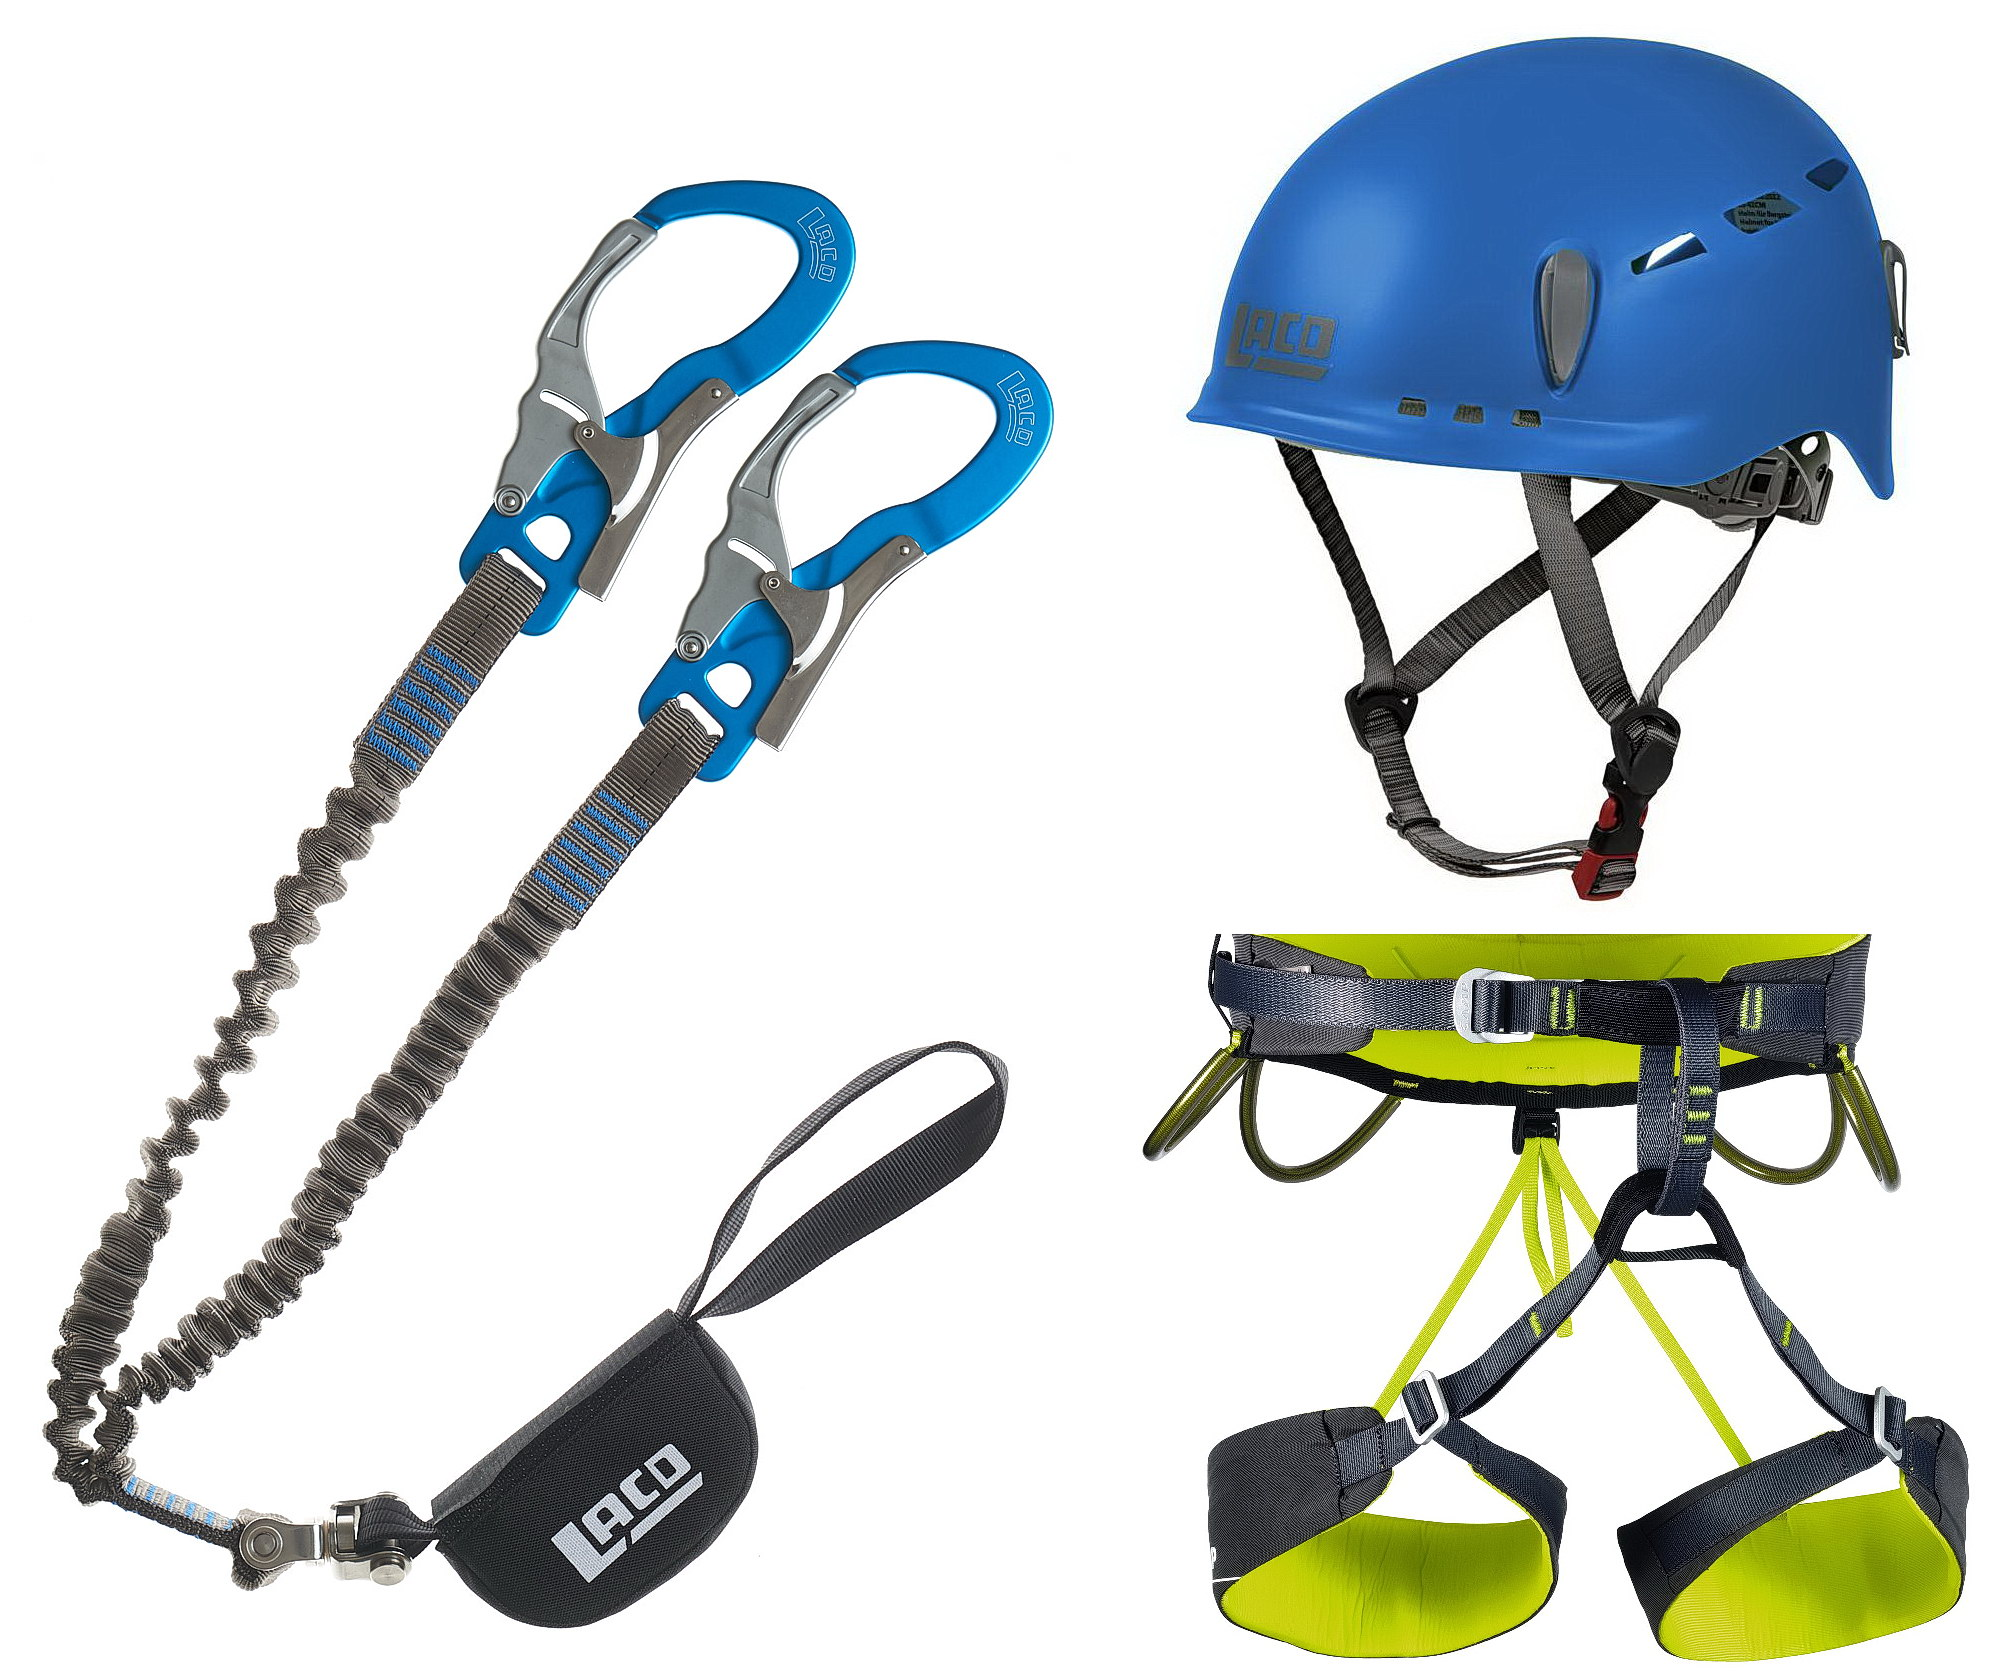 Klettergurt Salewa Civetta Petzl Klettersteigset Scorpio Vertigo Helm Meteor Fuchsia 53-61cm A71BF